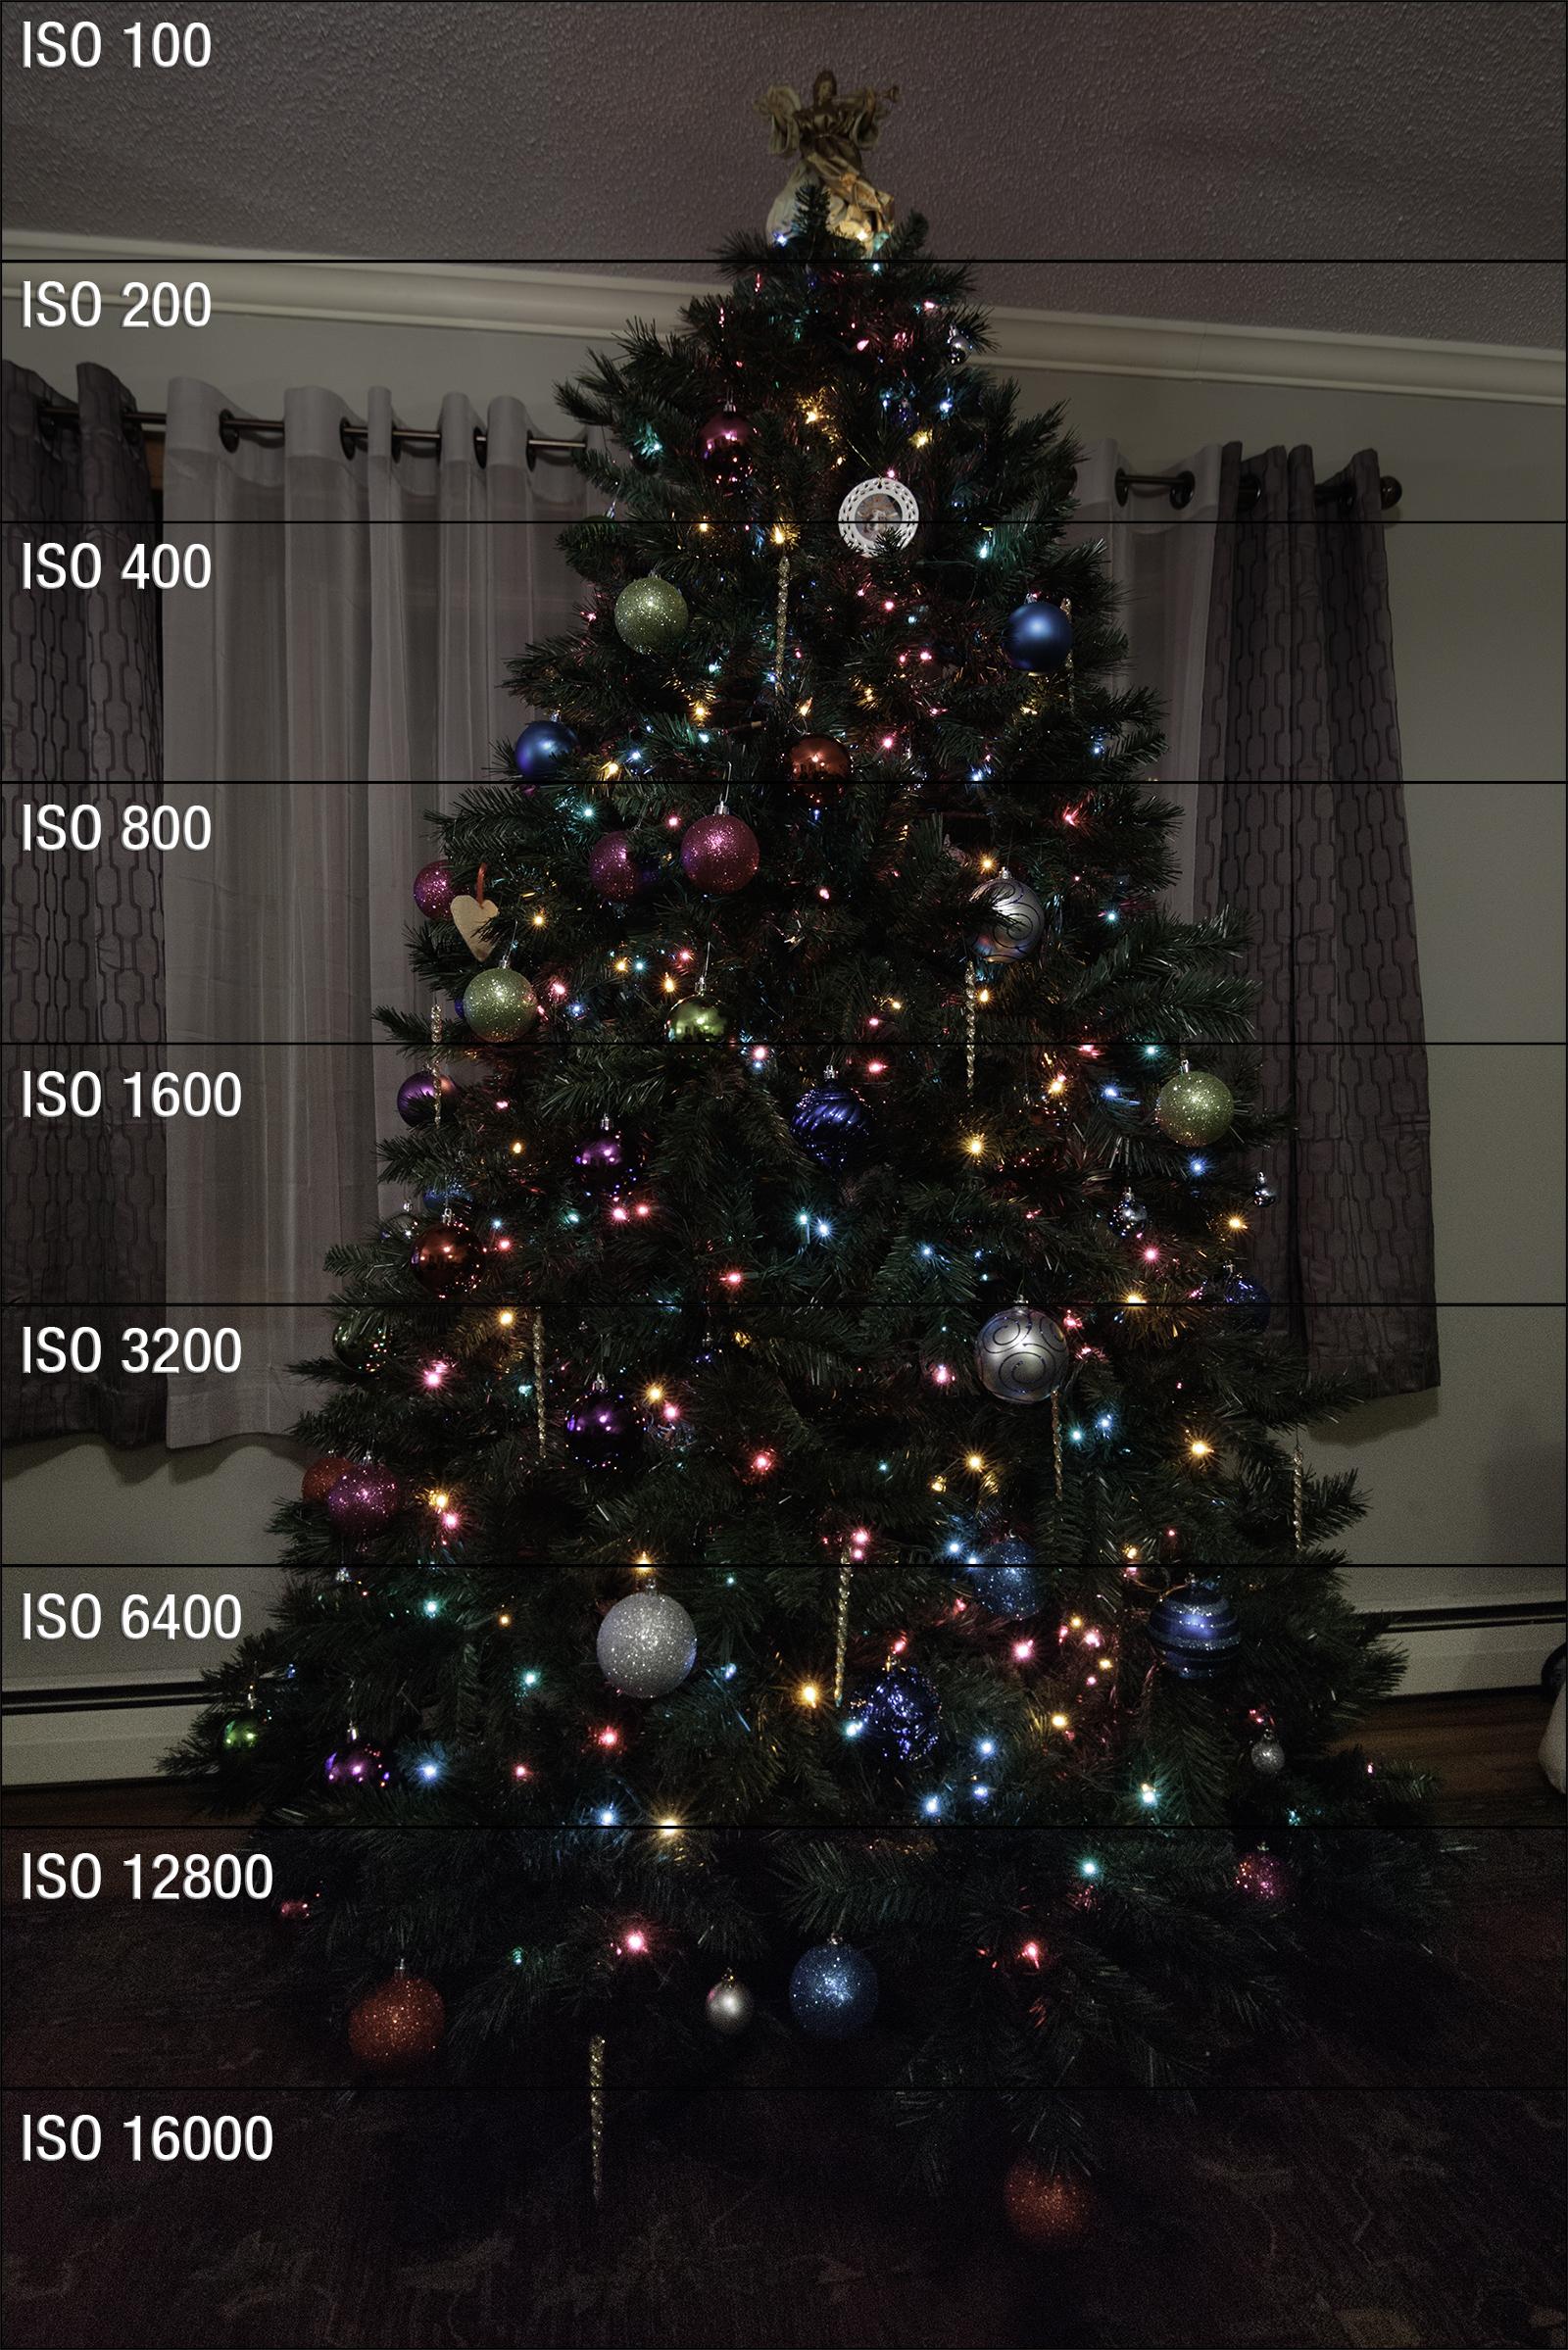 7D Mark II Christmas Tree ISO Test